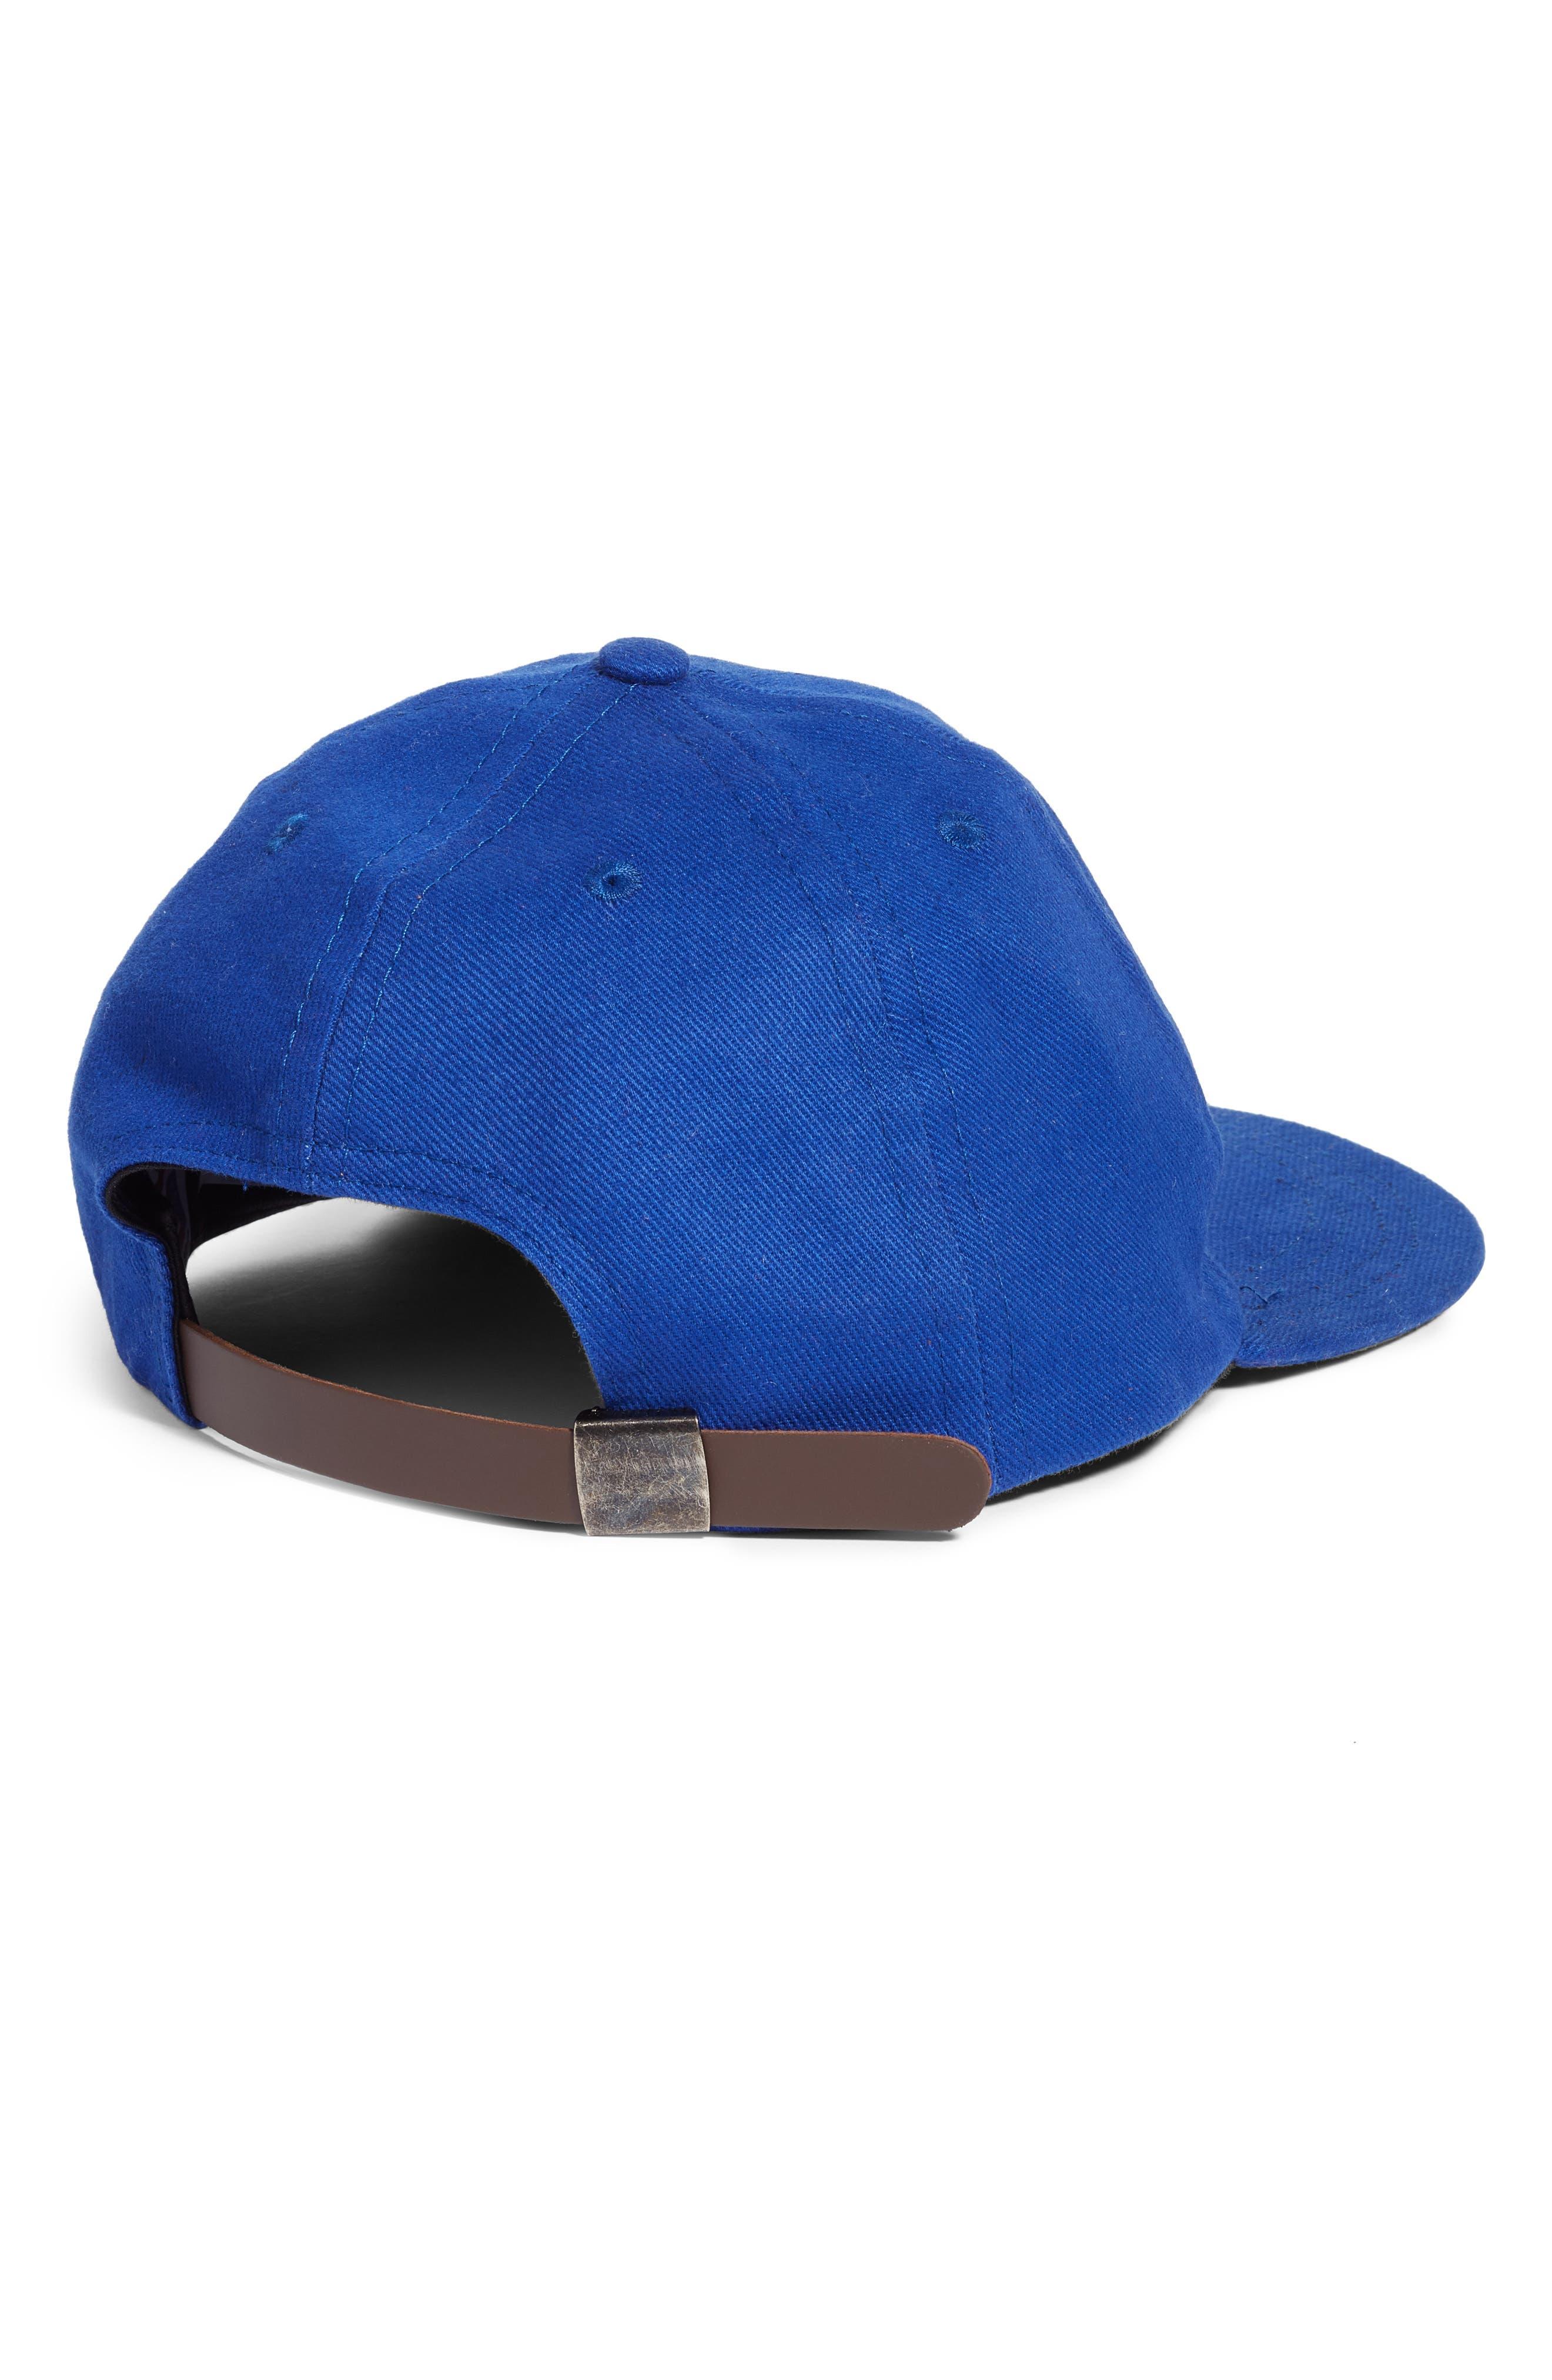 Beaded Cactus Baseball Hat,                             Alternate thumbnail 2, color,                             BLUE